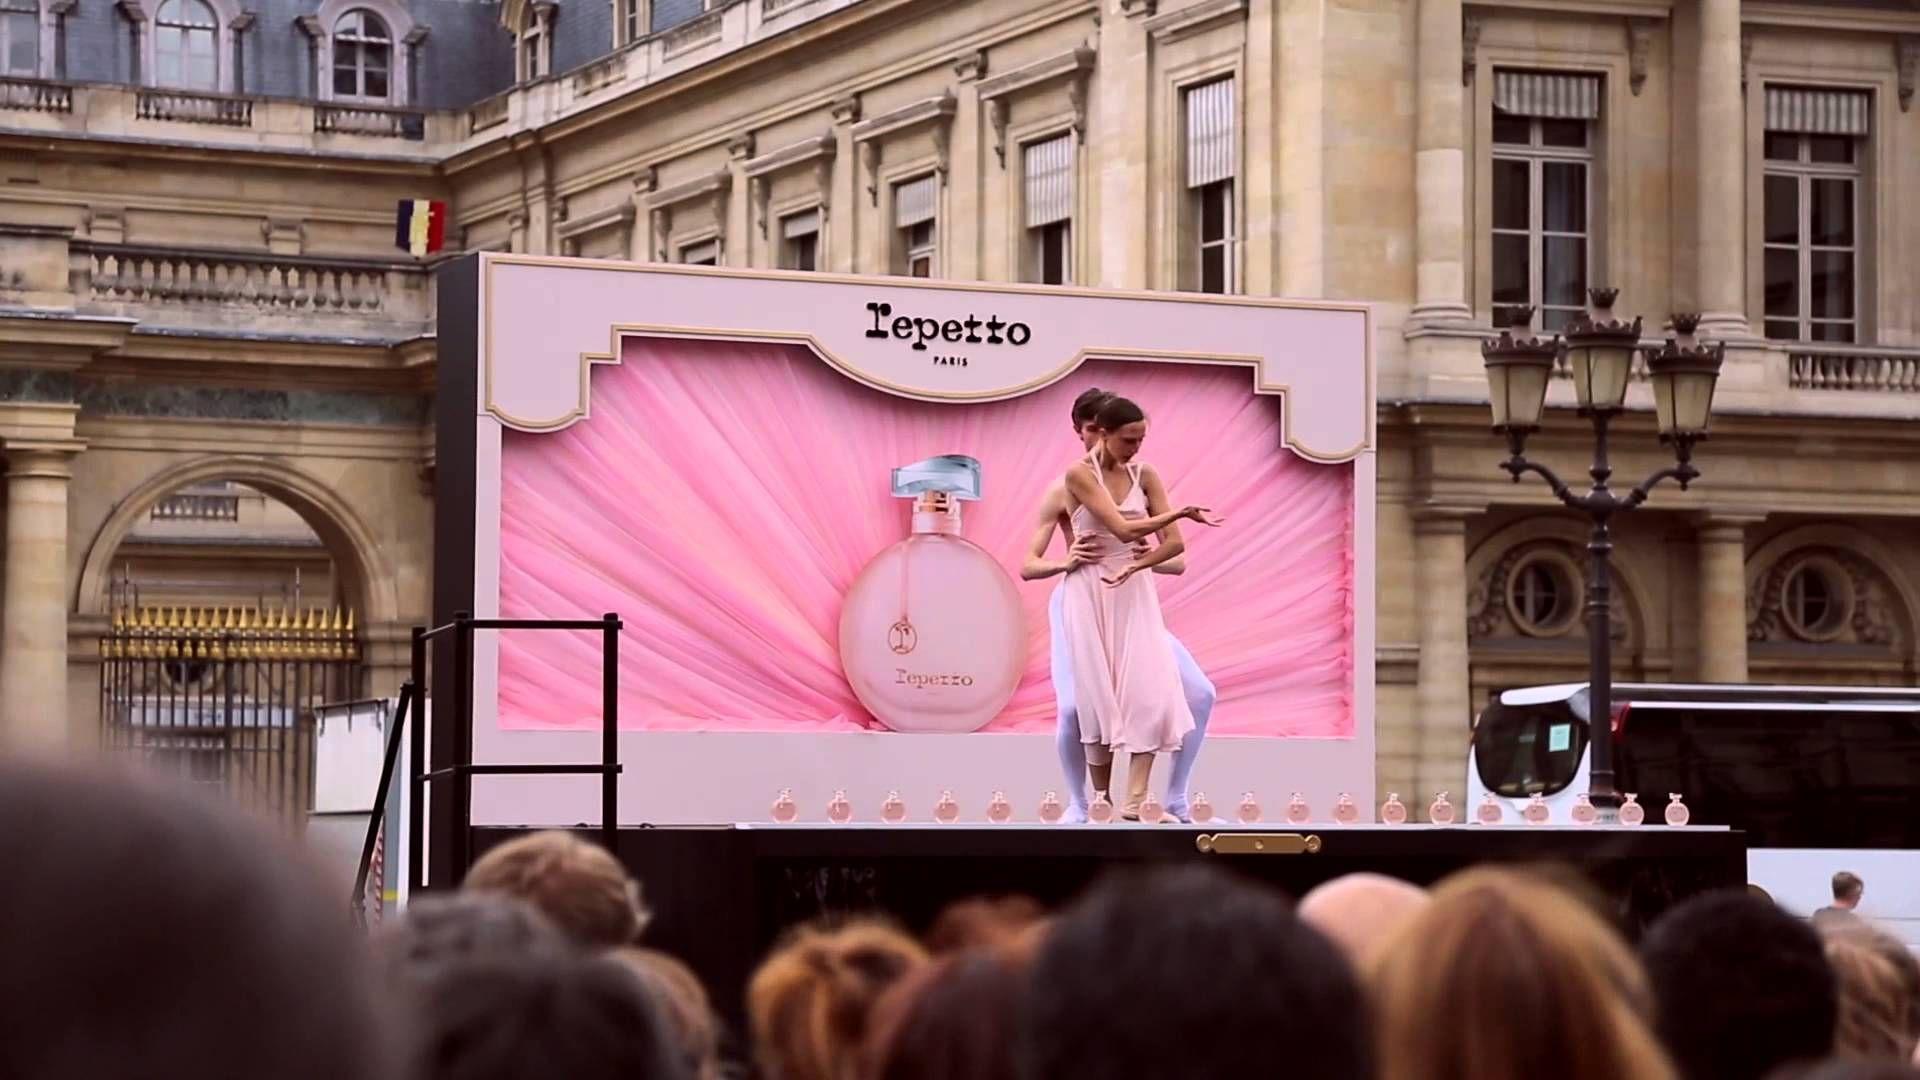 Video - Outdoor Ballet by Repetto for the launch of its 'Eau de Parfum' at the 'Place du Palais Royal' in Paris #balletacielouvert #repetto #repettoparfum